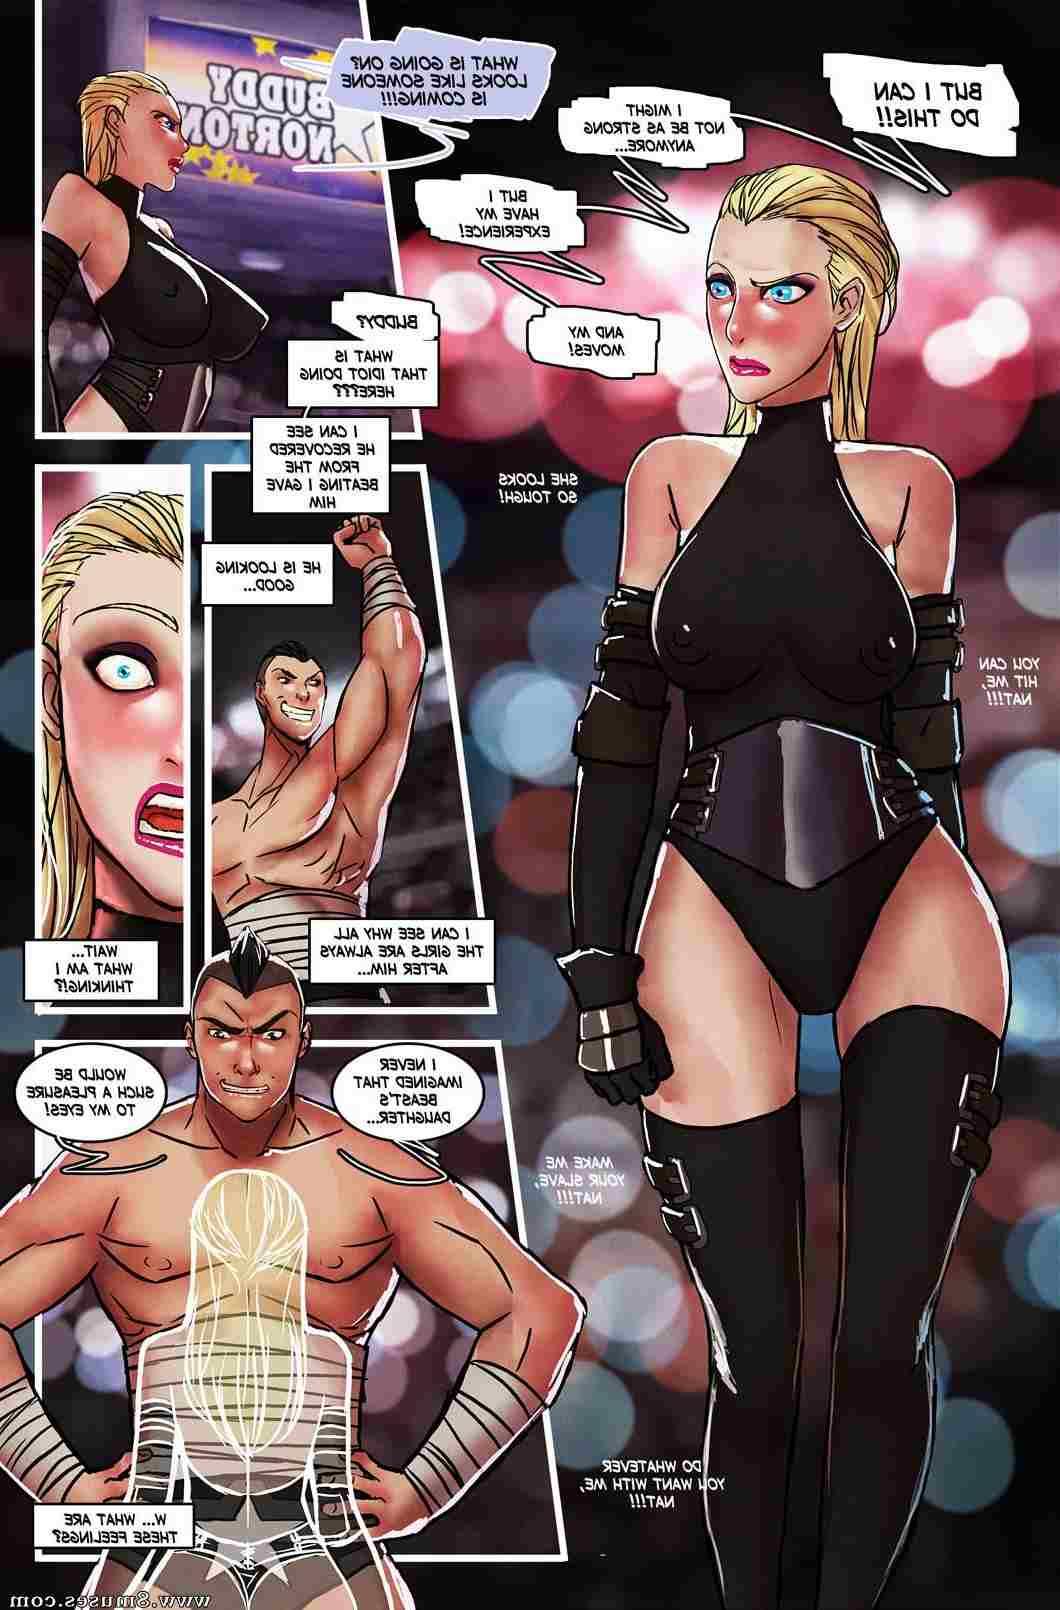 TG-Comics/Kannel/The-Heel The_Heel__8muses_-_Sex_and_Porn_Comics_17.jpg